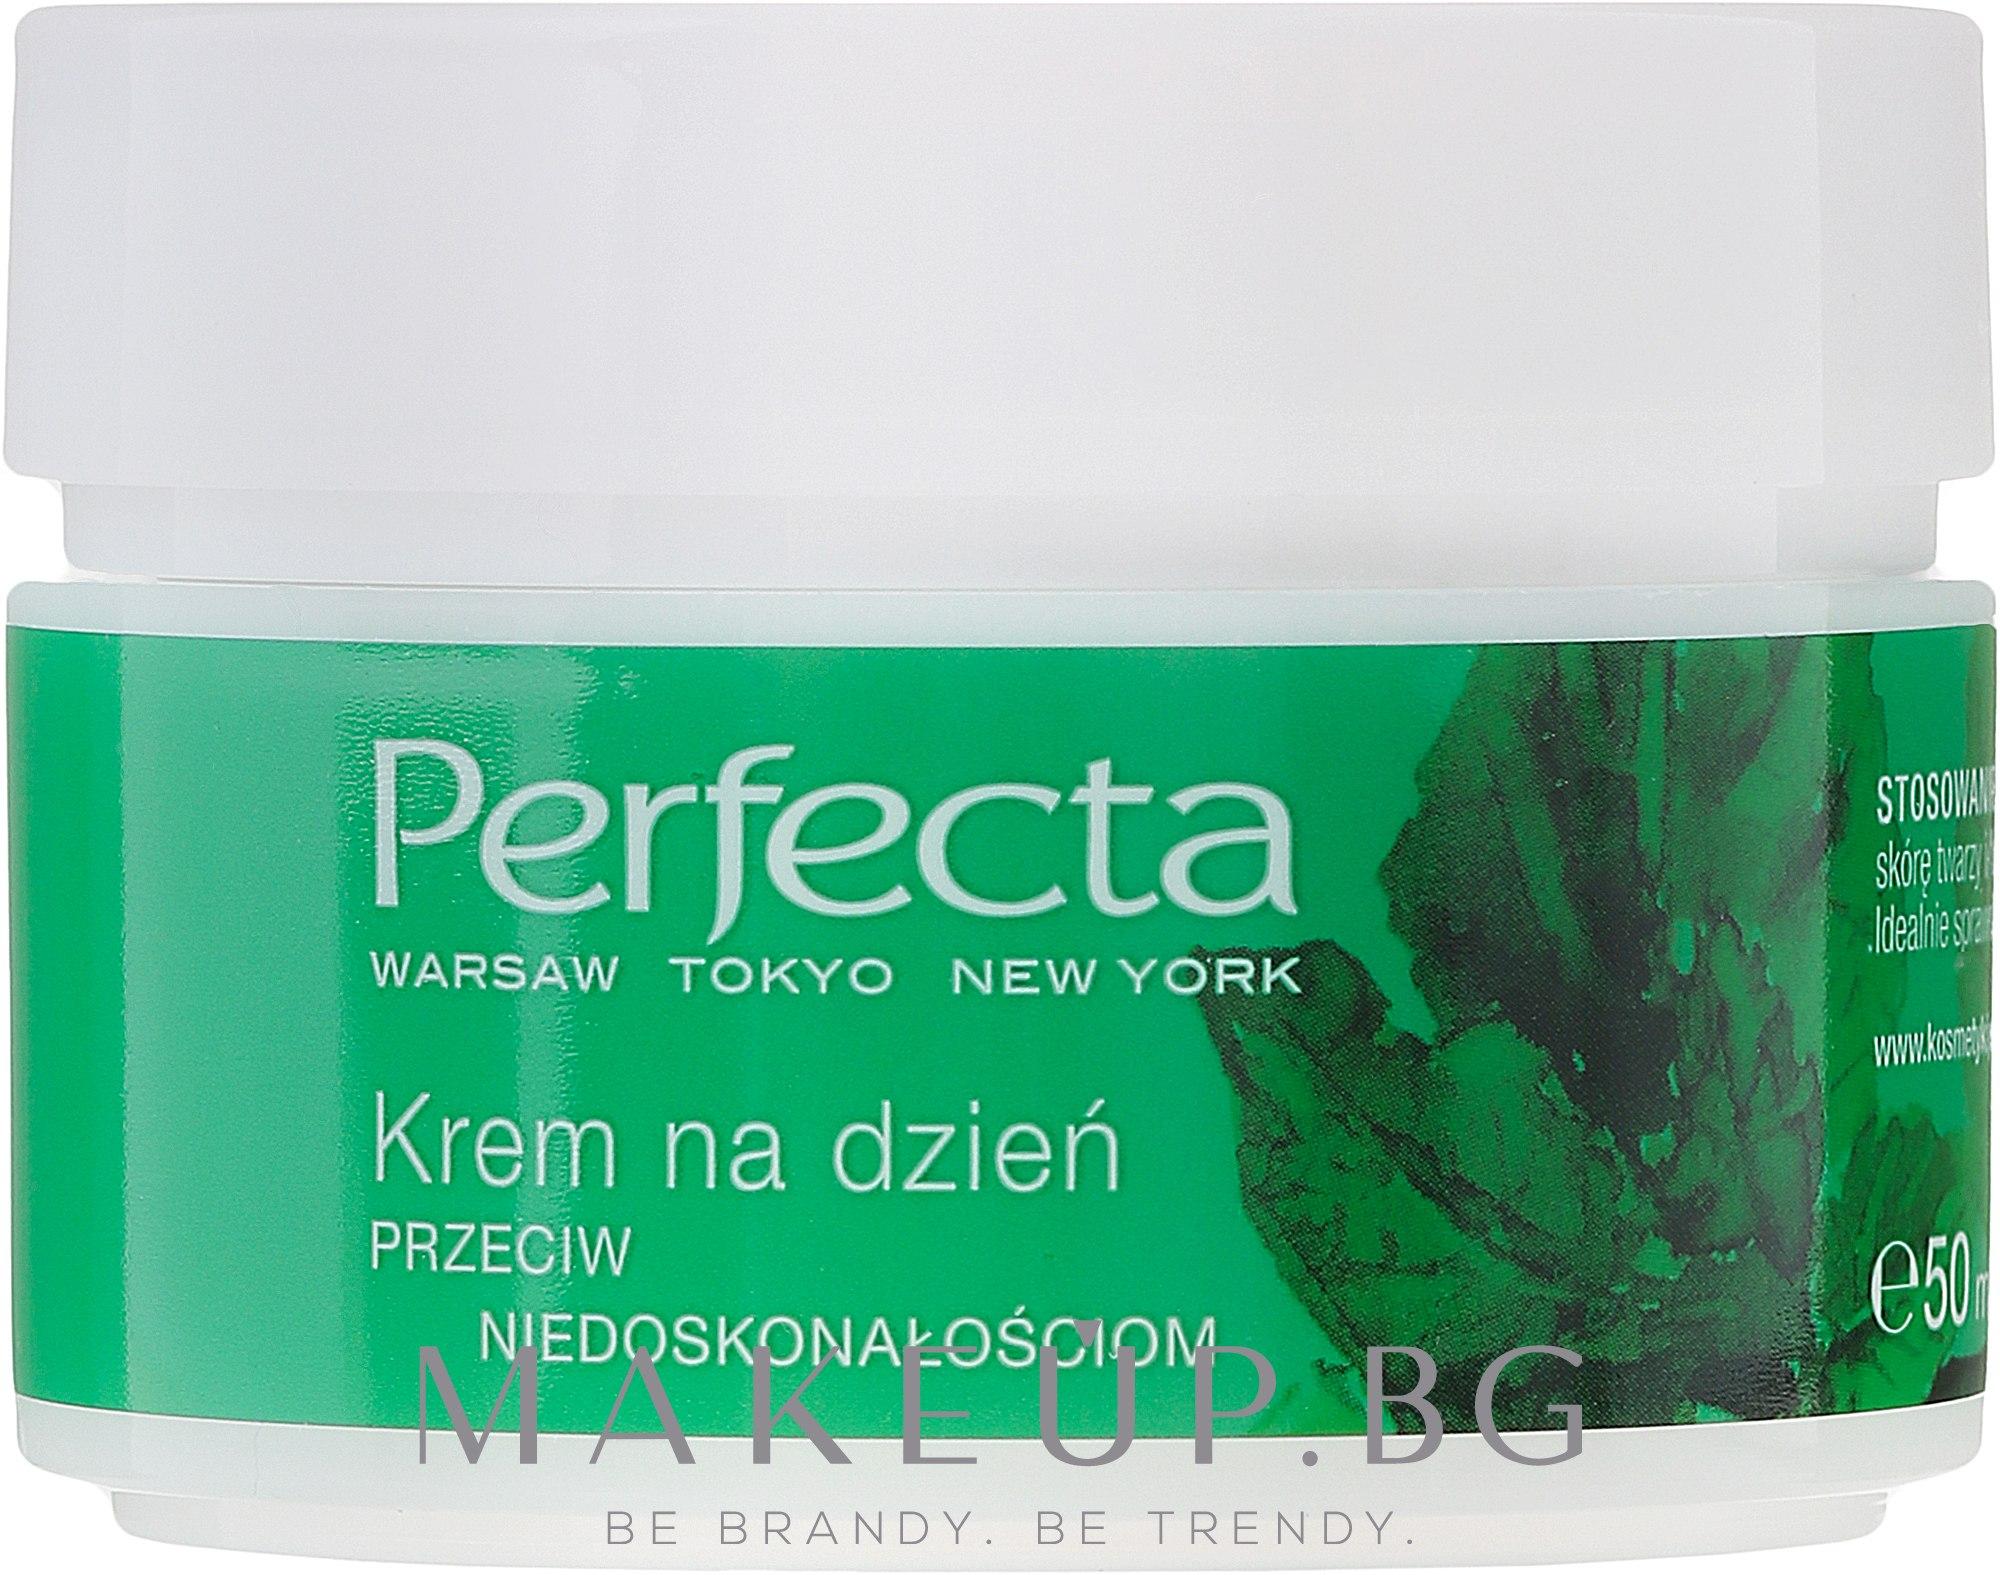 Дневен крем за лице - Perfecta Your Time is Green — снимка 50 ml